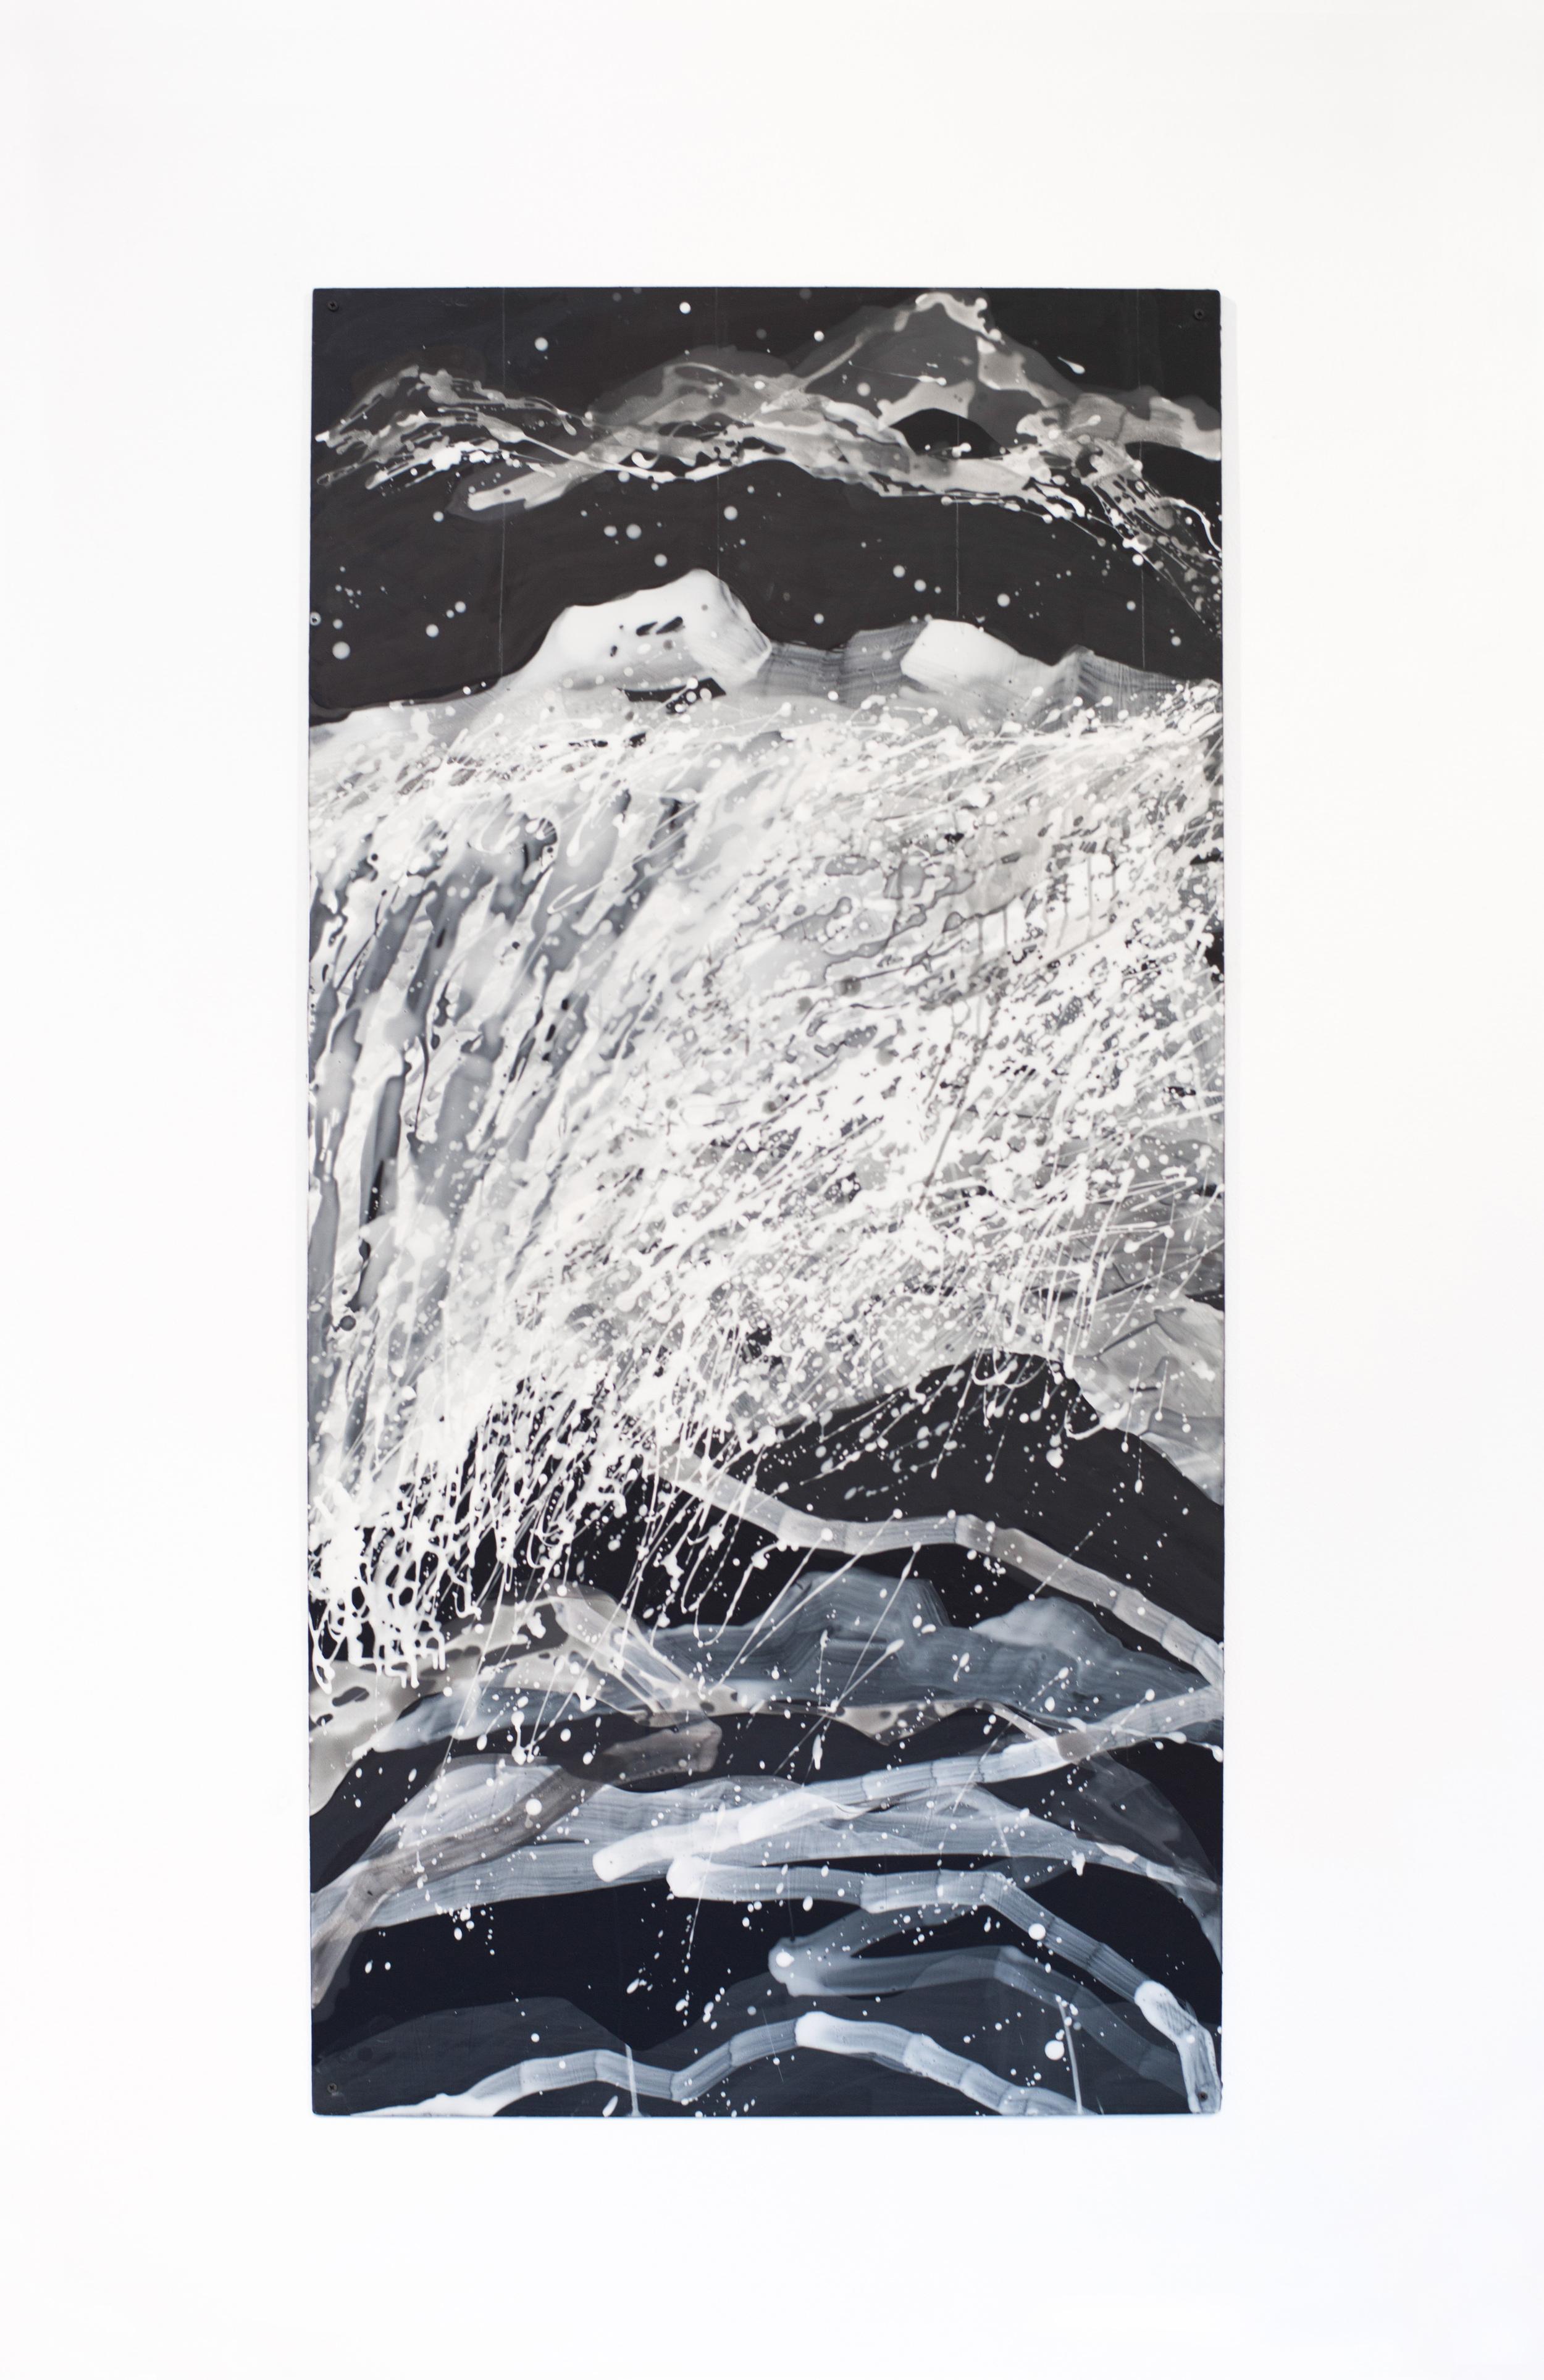 Nancy Manter    Endless Landscape #2 ,  2012  Collage, distemper on aluminum panel 60 x 40 inches